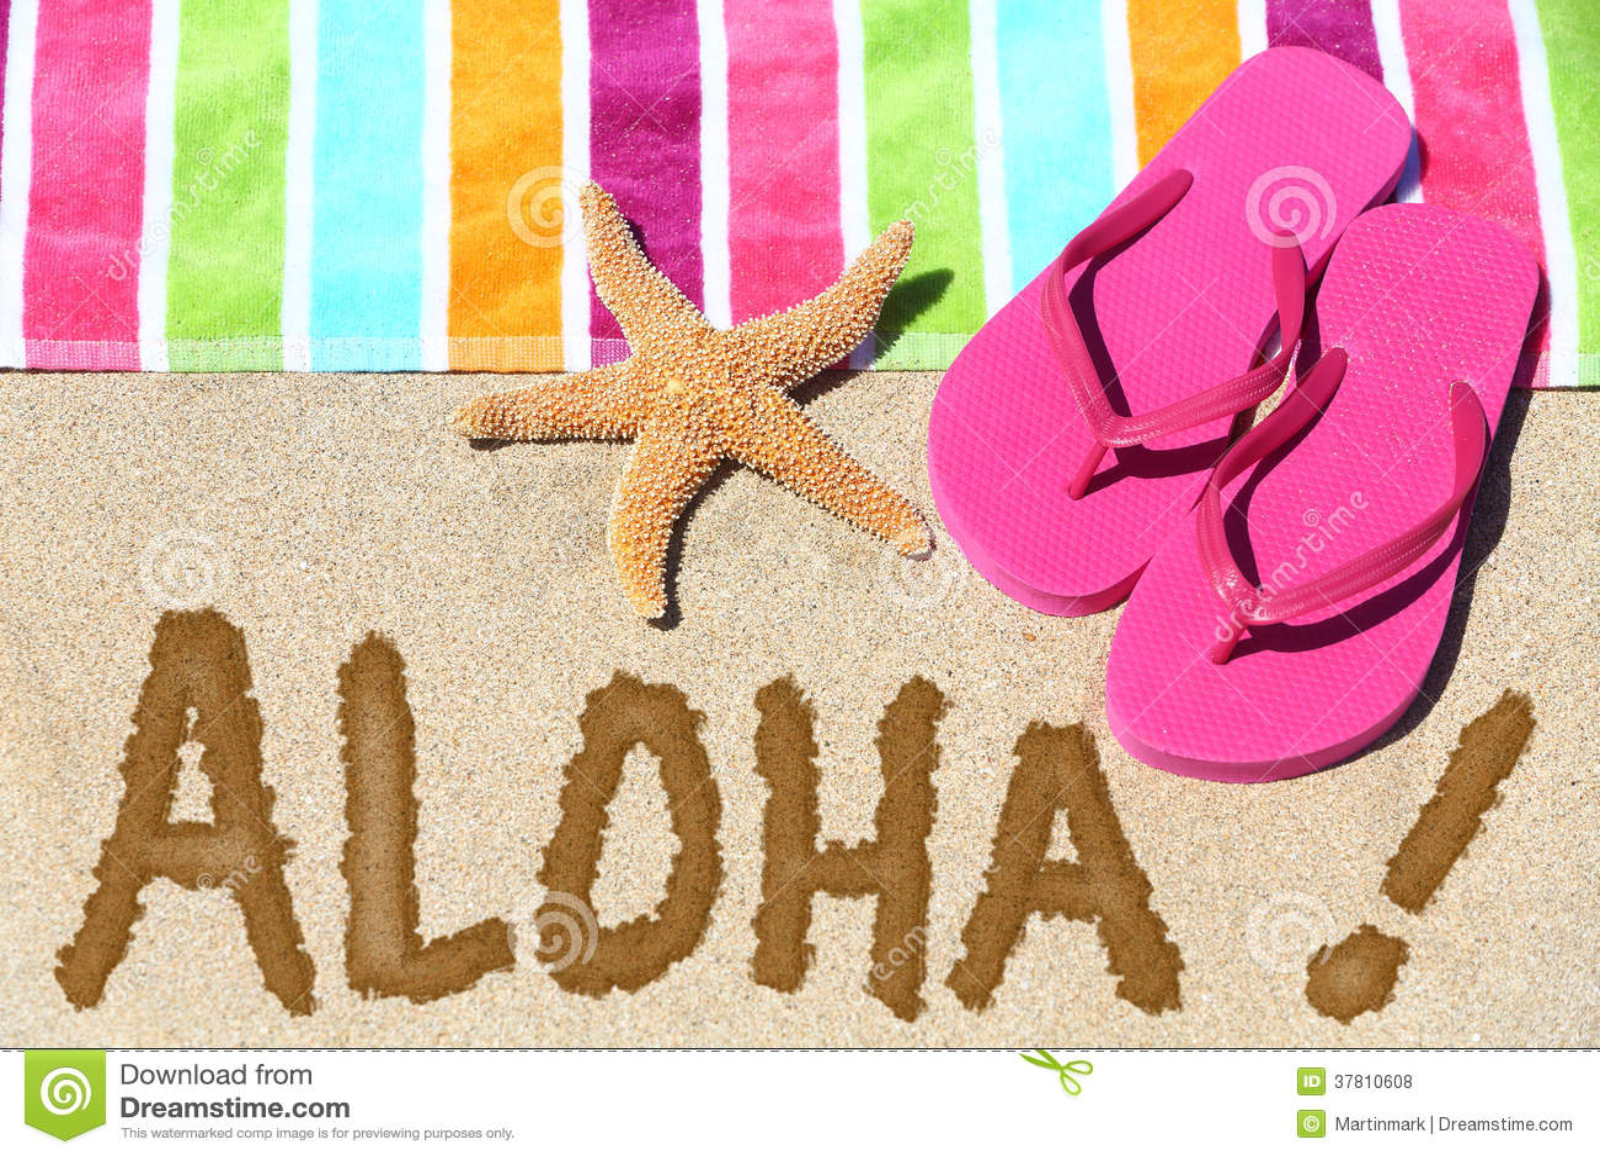 Free Video Aloha